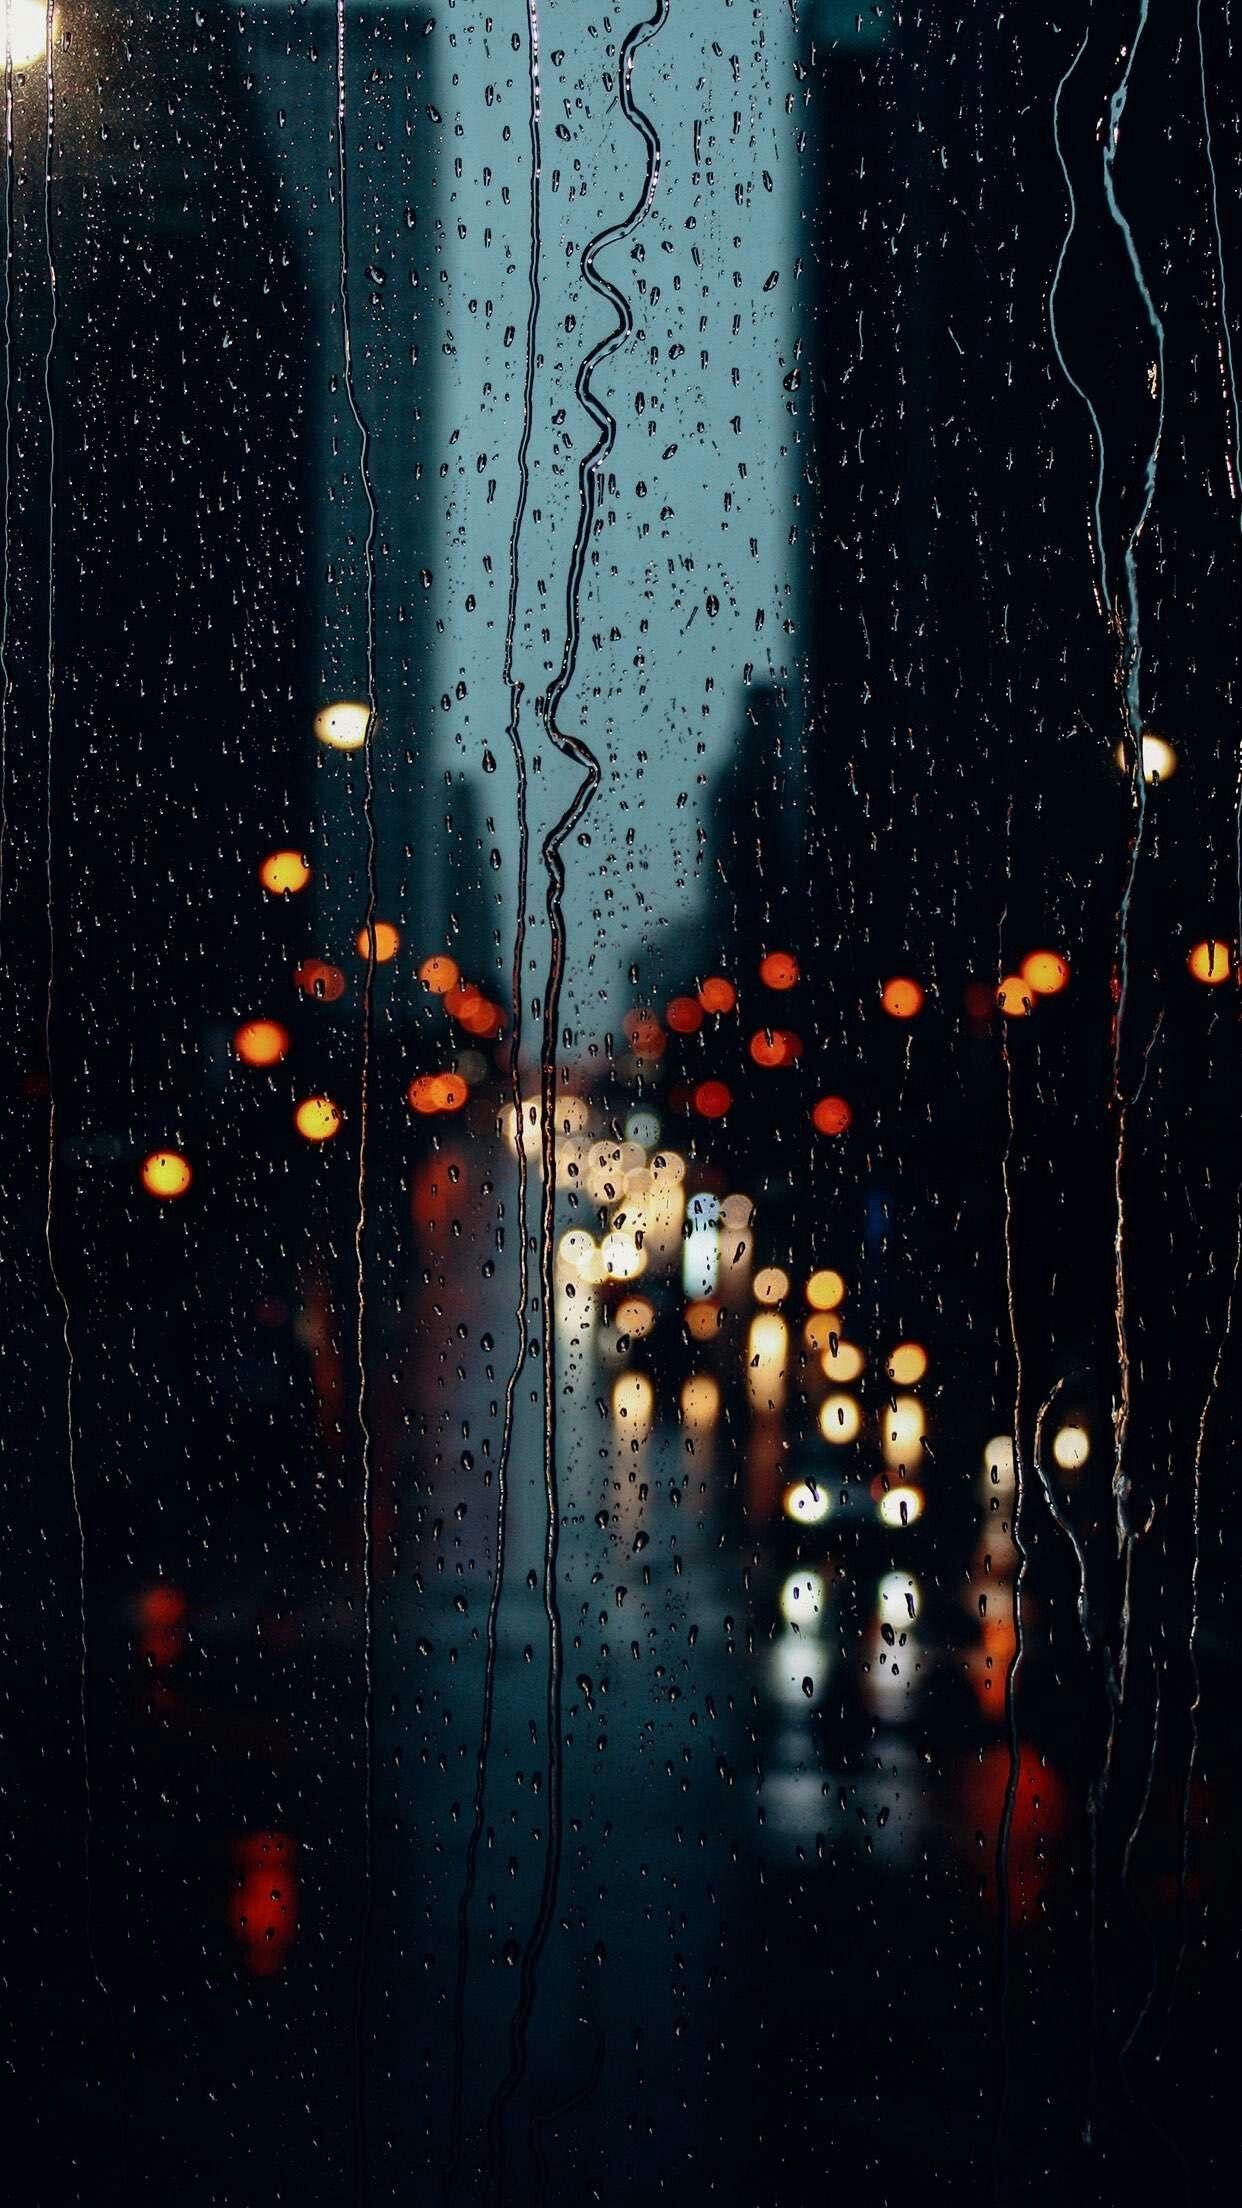 Pin By Iyan Sofyan On Rain In 2019 Rain Wallpapers Rainy